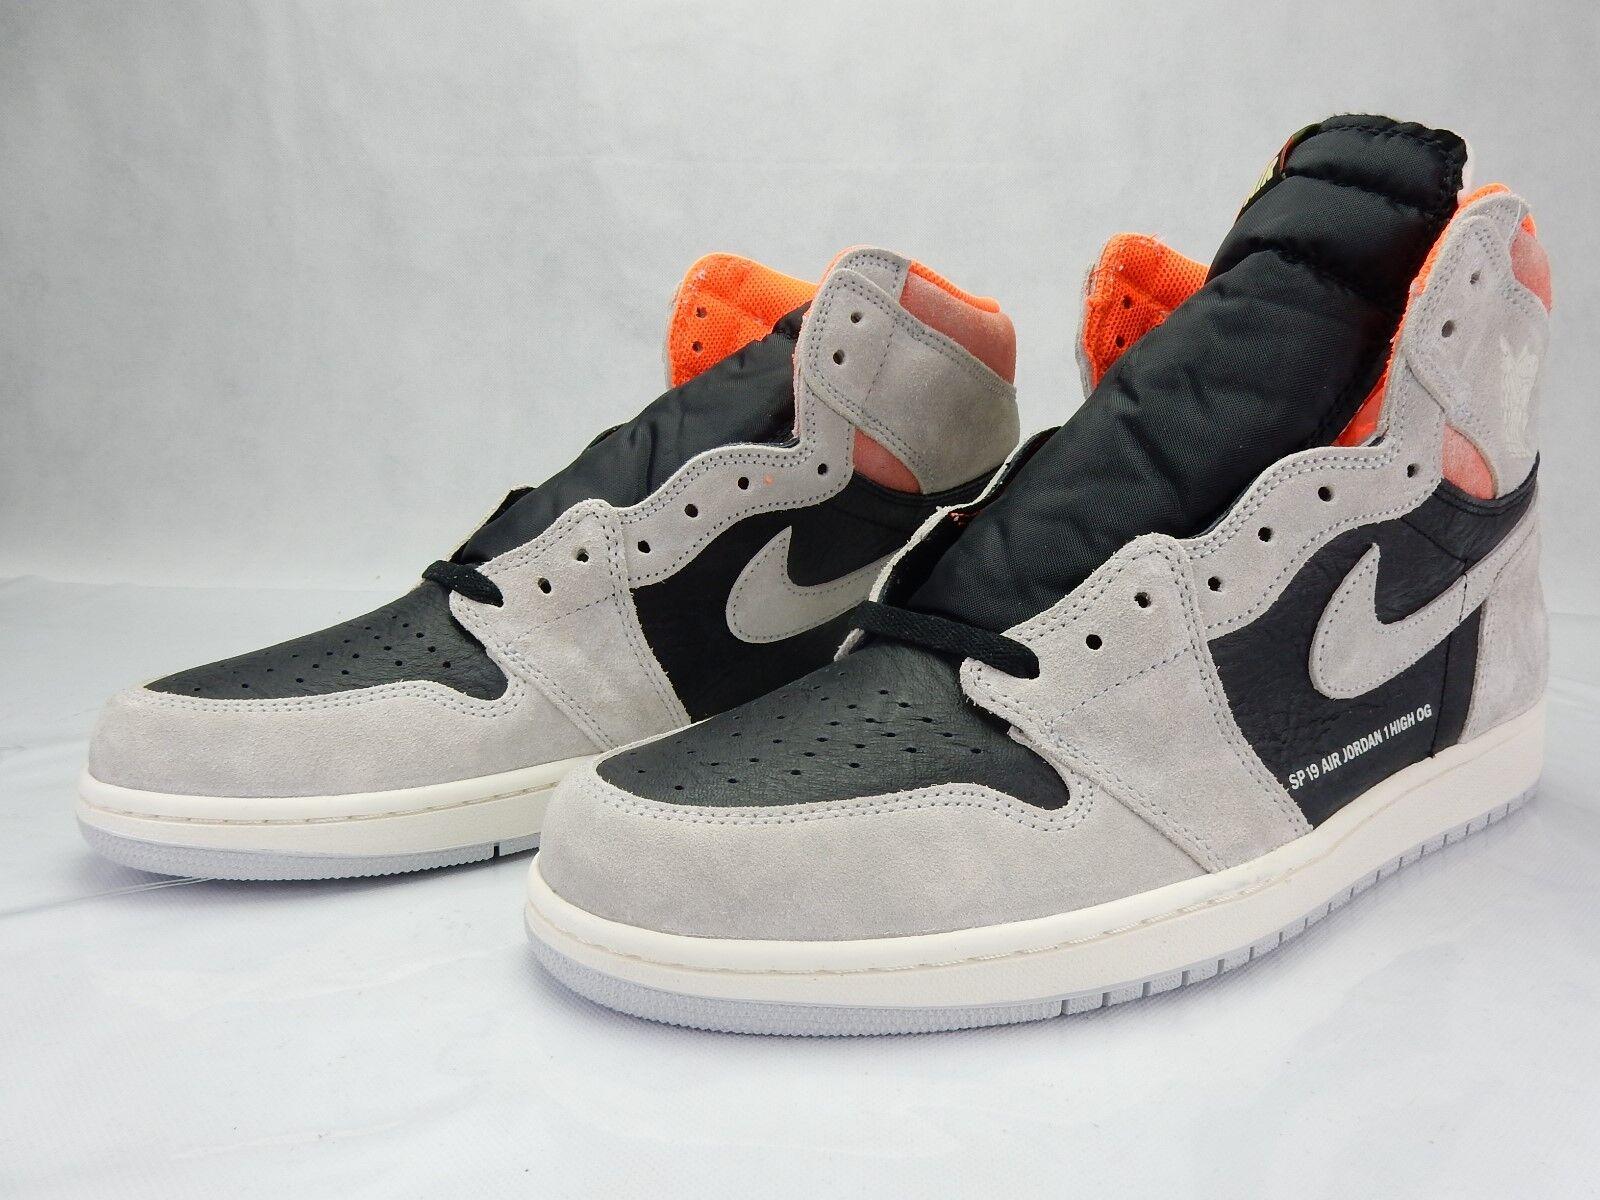 Nike Air Jordan 1 Neutral Grey Hyper Crimson Black 555088 018 Size 14 Sneakers S